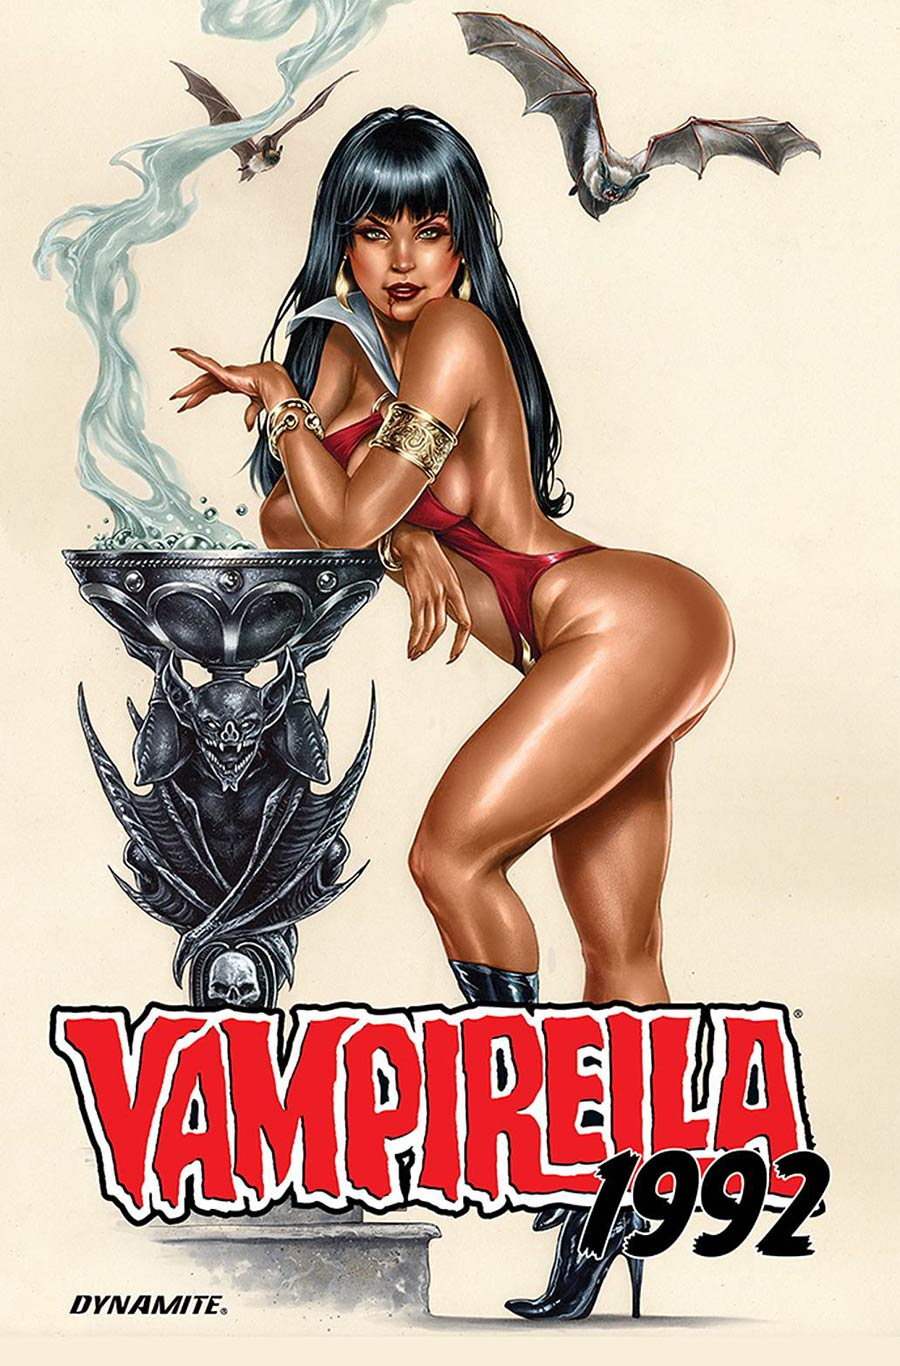 Vampirella 1992 #1 (One Shot) Cover A Regular Mike Krome Cover